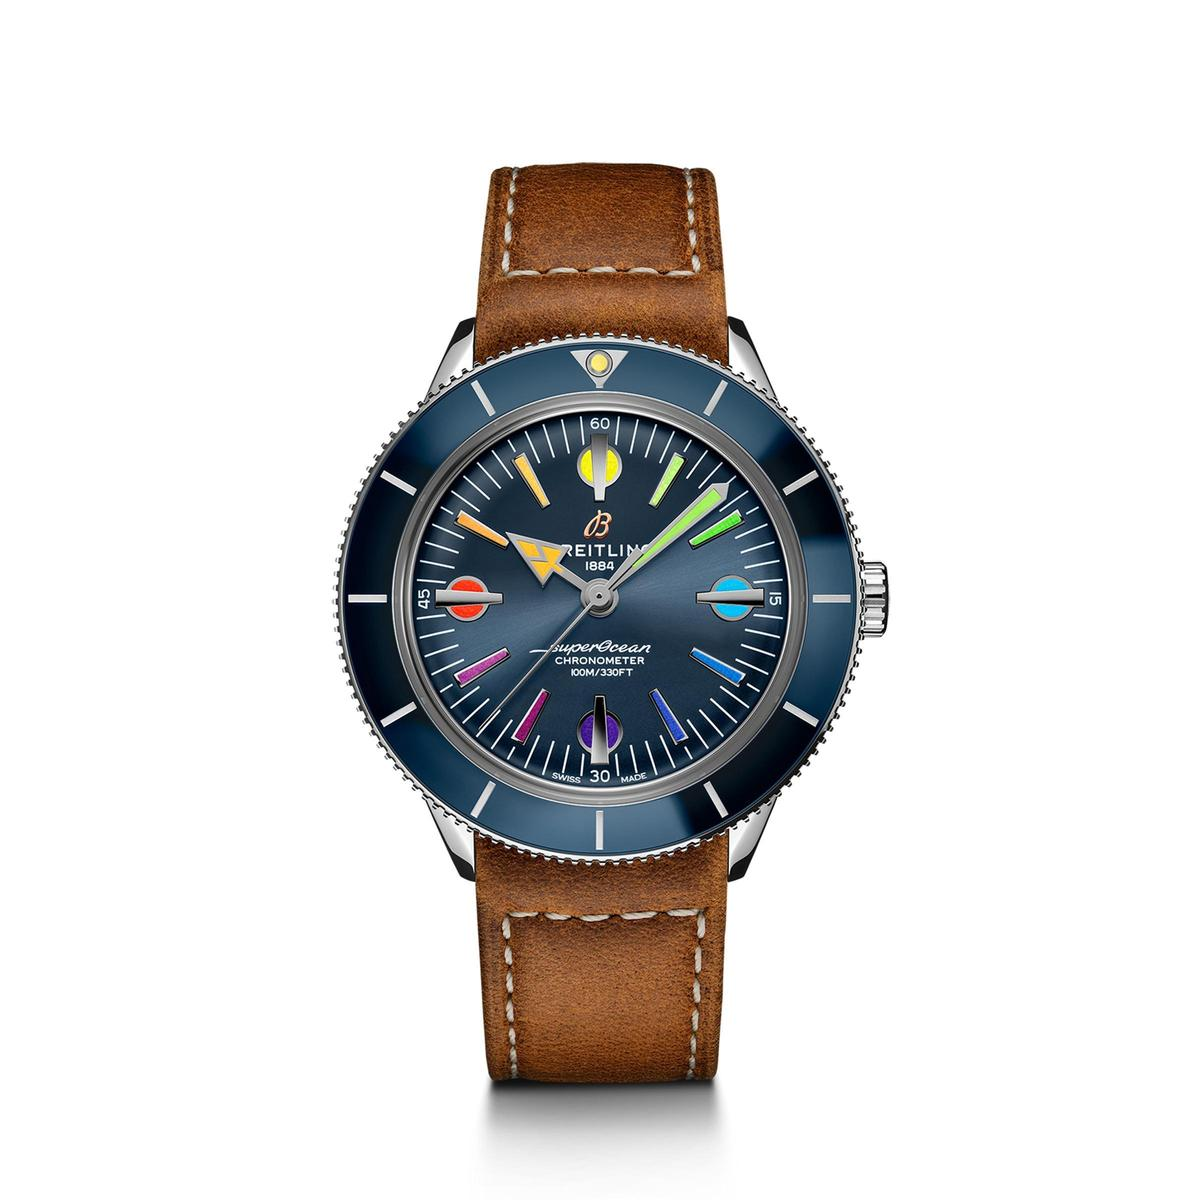 Superocean Heritage 57彩虹版第二代腕錶,全球限量1,000只,定價為150,000 (米蘭鏈帶)、NT$134,000(皮革錶帶)。